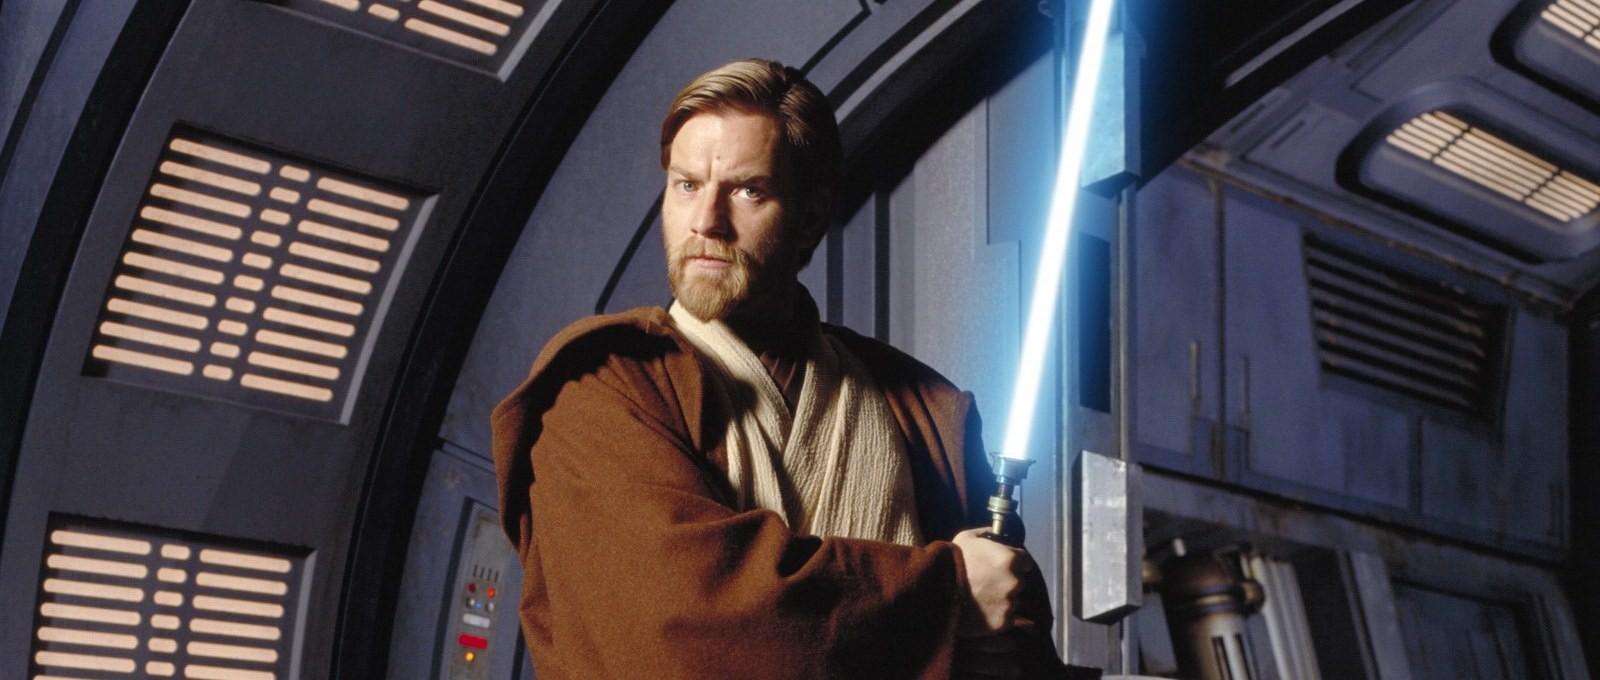 Производство сериала об Оби-Ване Кеноби приостановлено